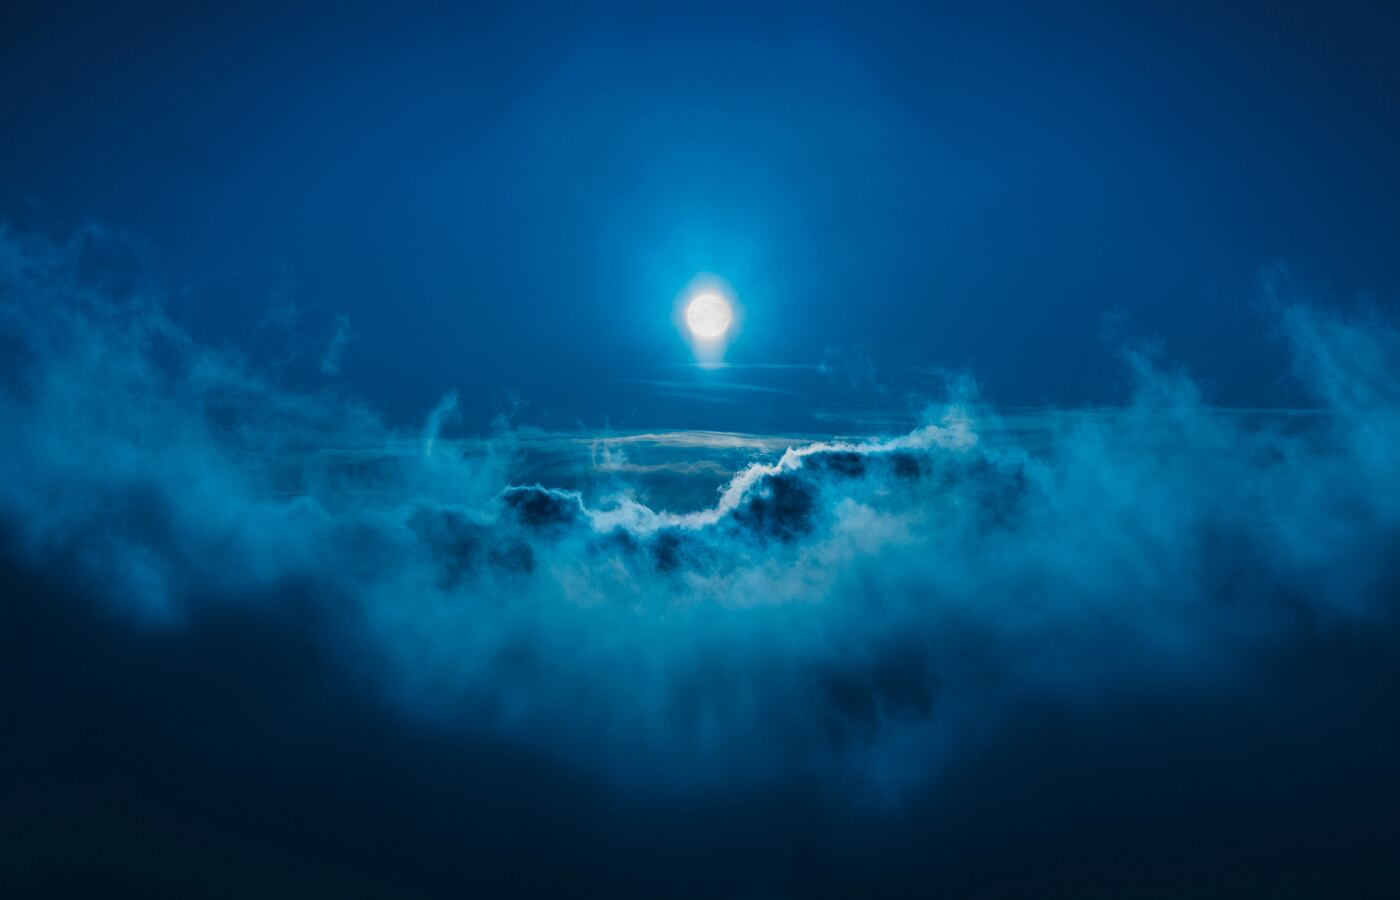 moon-night-landscape-clouds-5k-4c.jpg